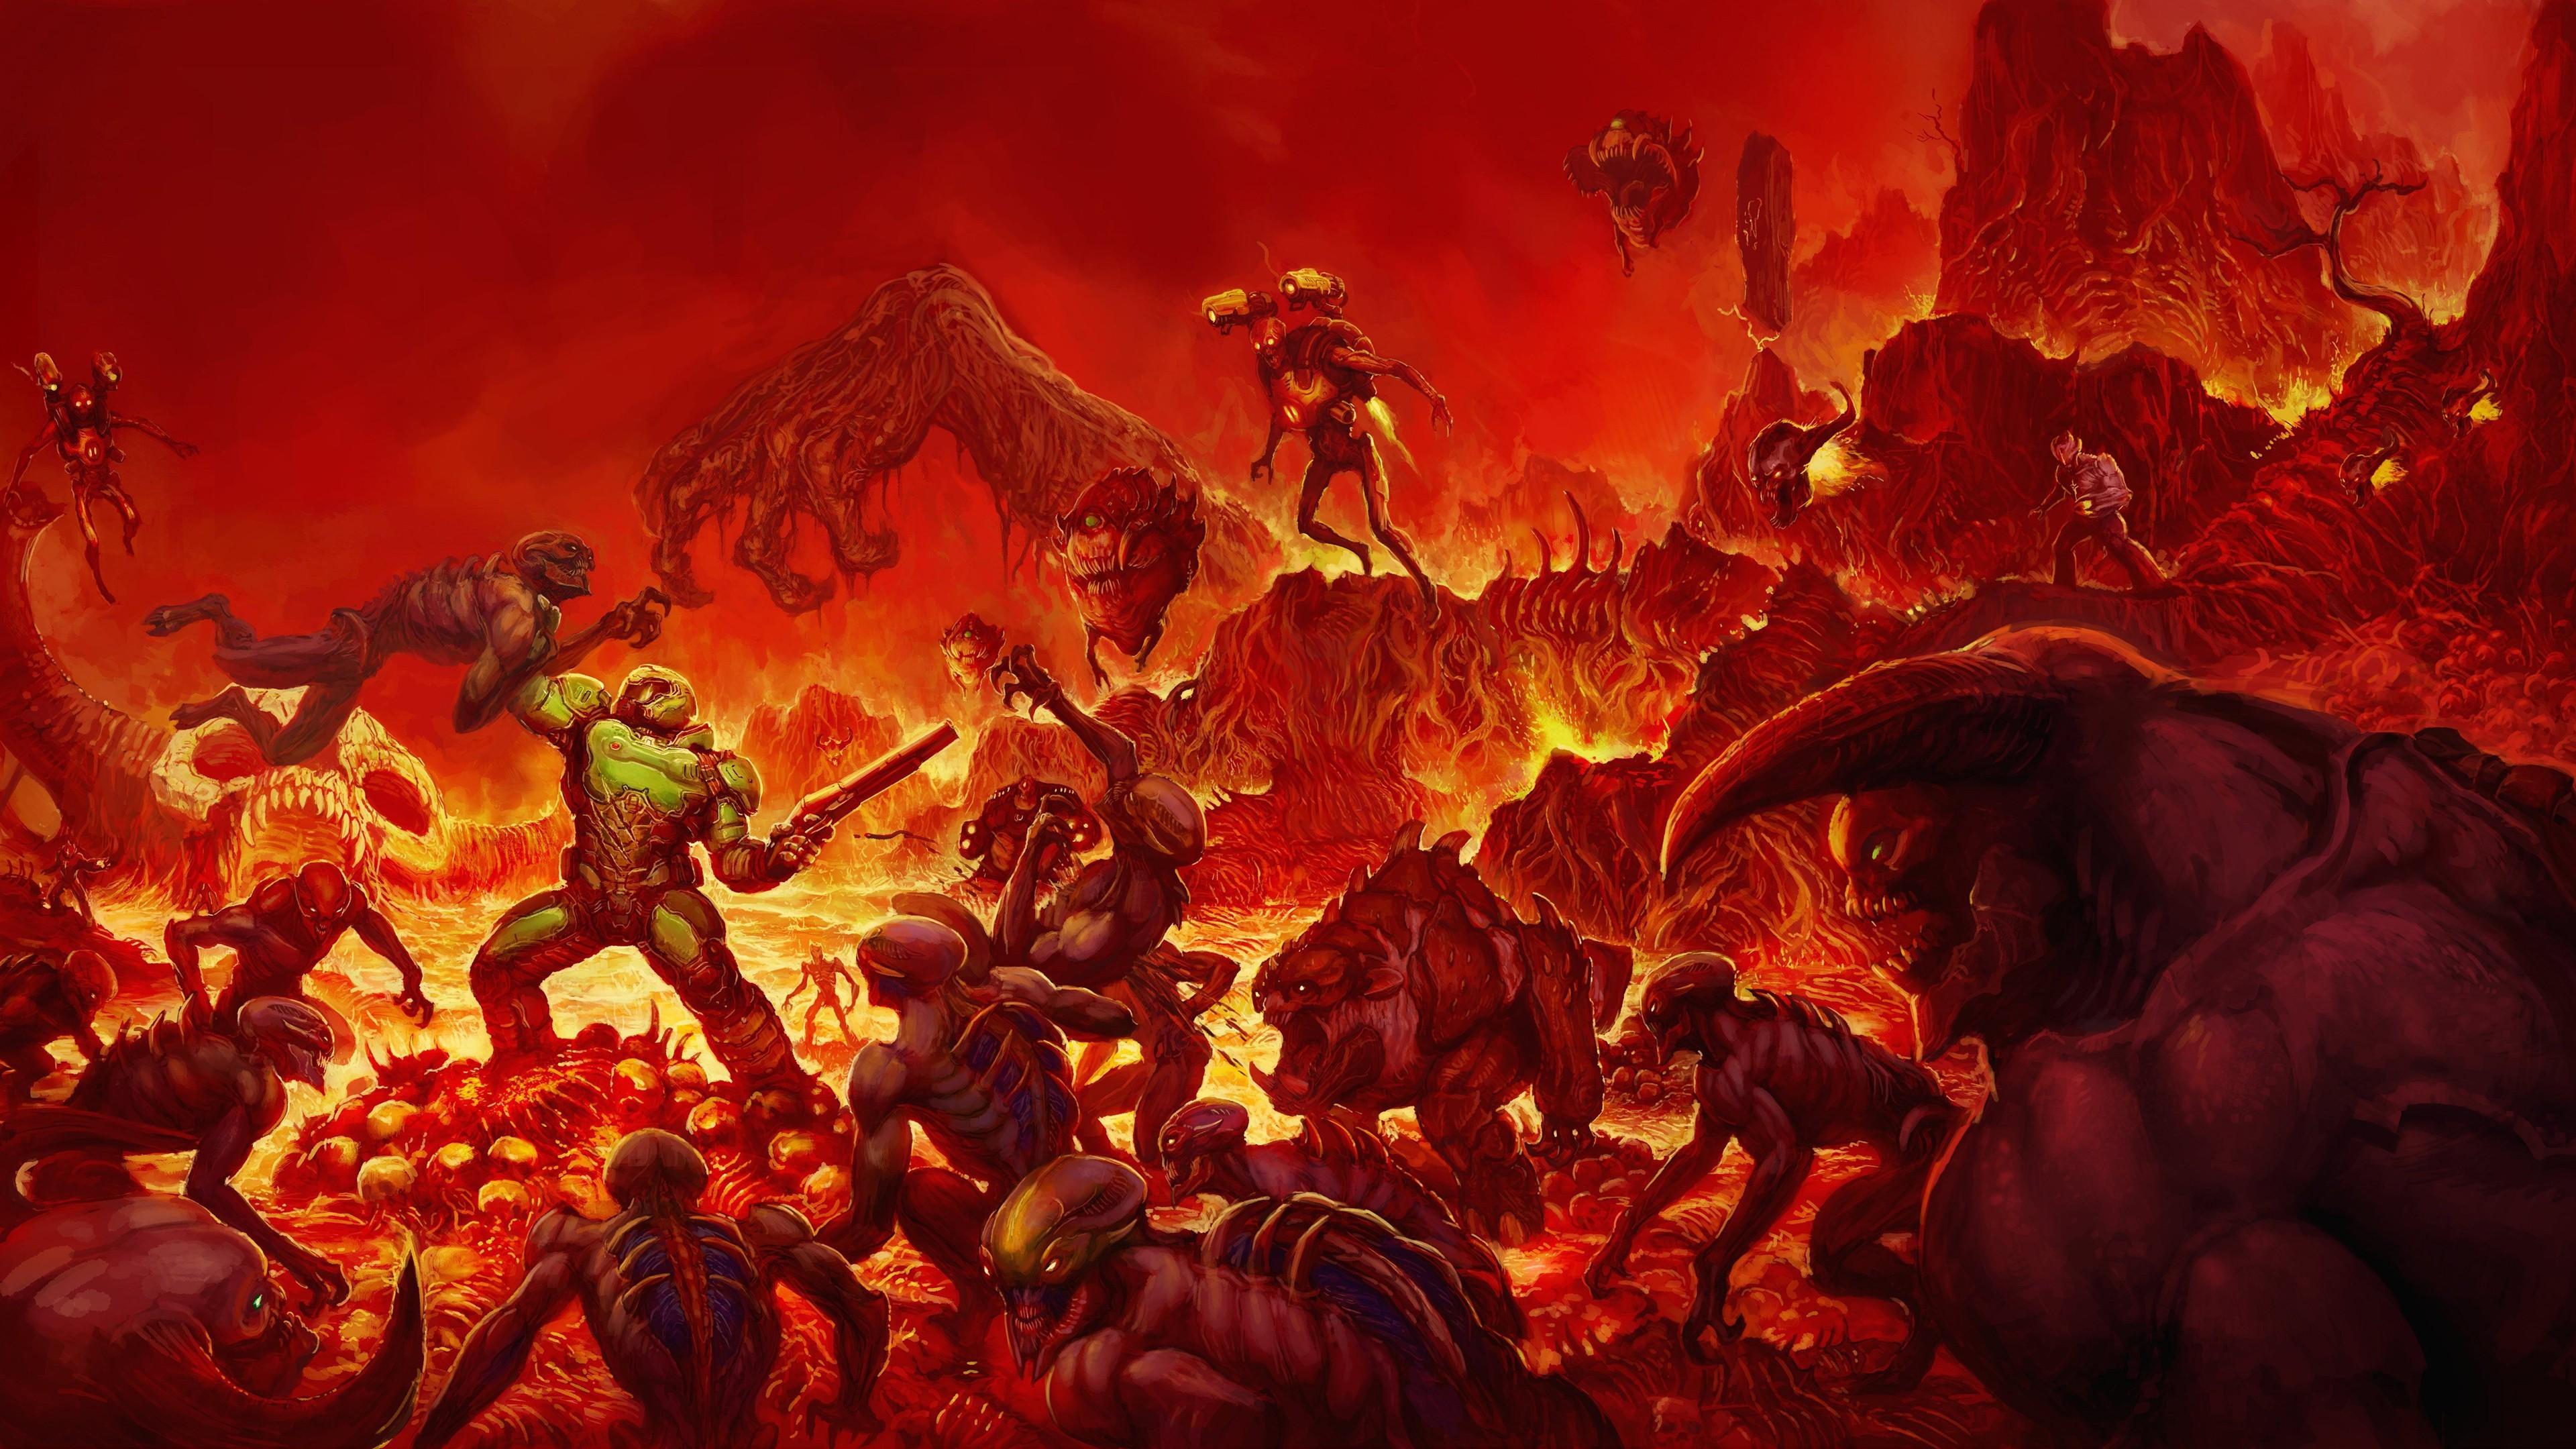 3840x2160 Px Bethesda Softworks Doom 4 Id Software